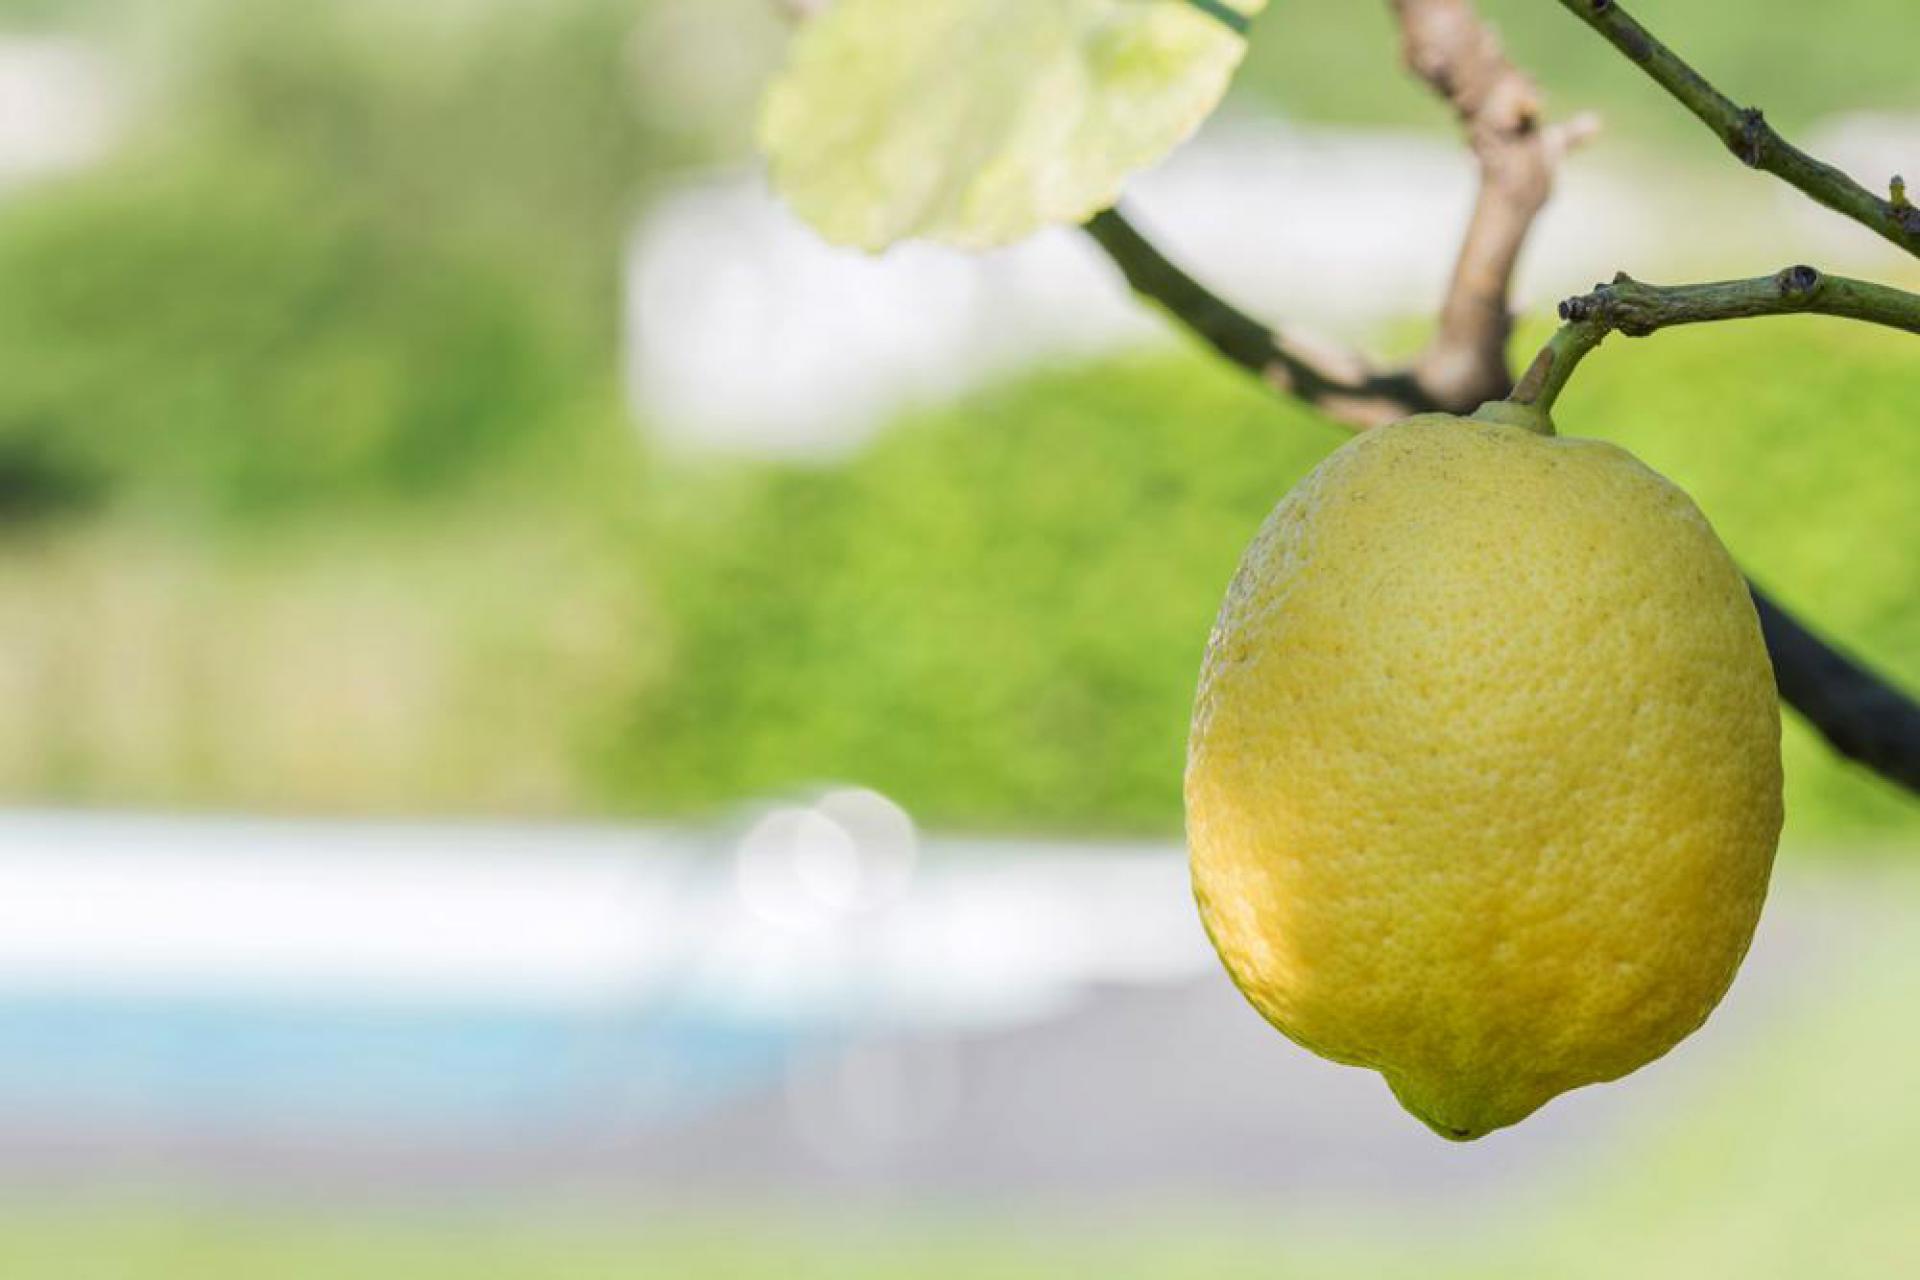 Agriturismo Comomeer en Gardameer Gezellige agriturismo op loopafstand van Comomeer | myitaly.nl